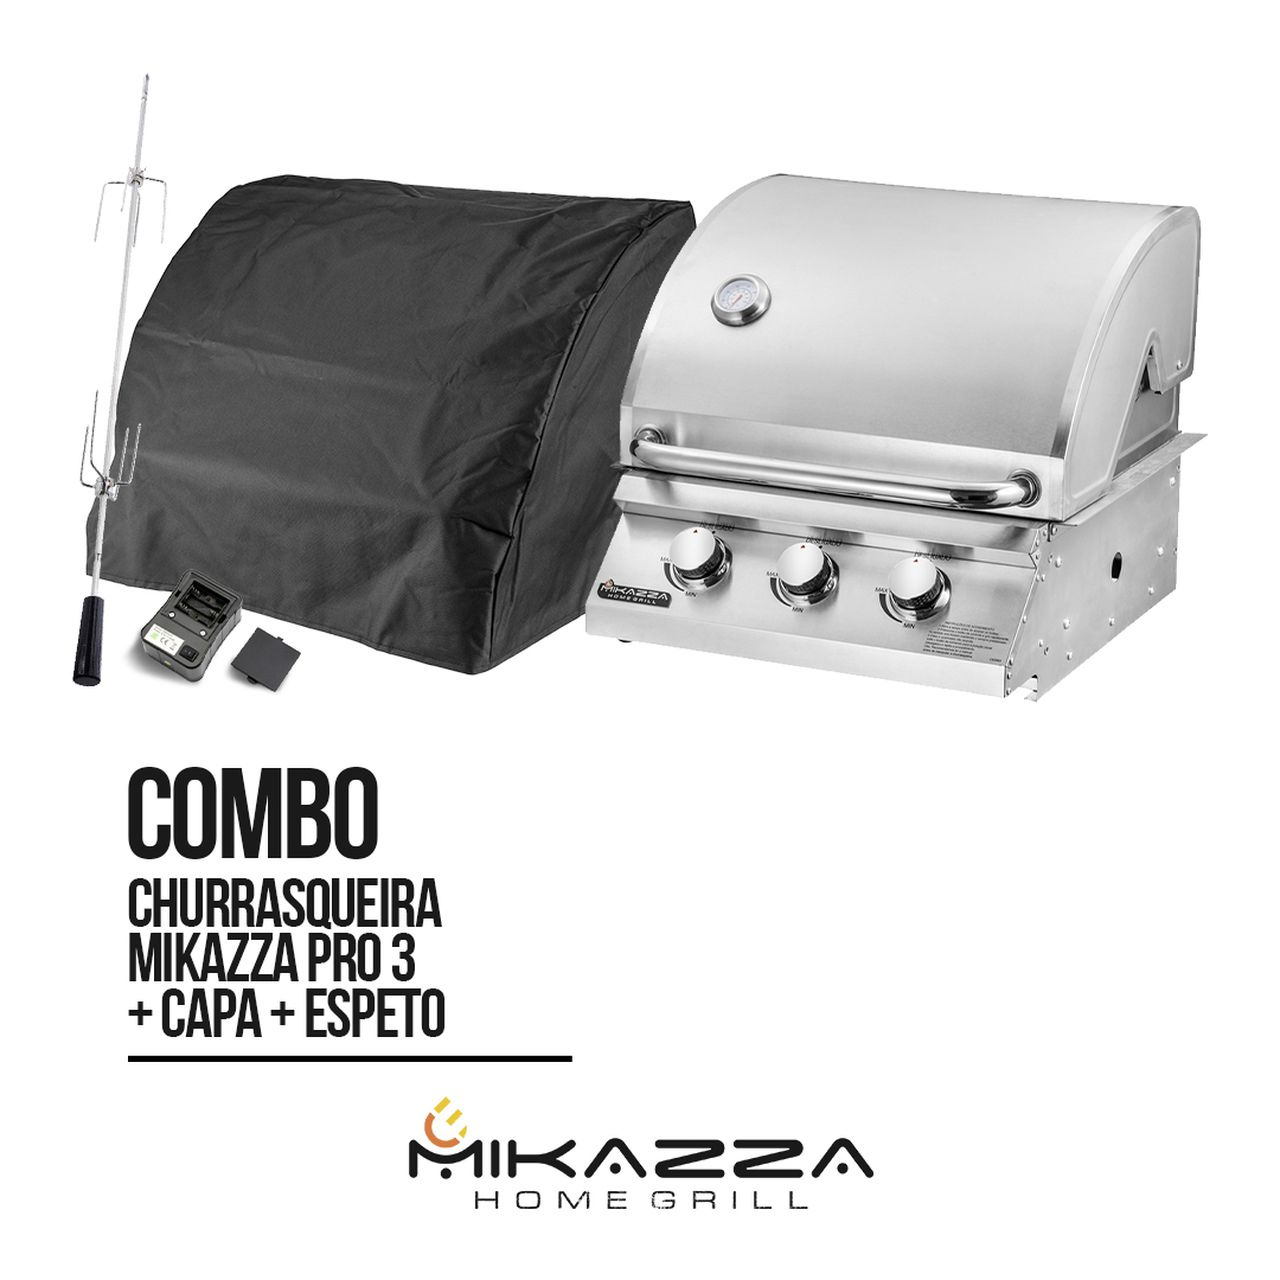 Churrasqueira à Gás Embutir Mikazza Pro 3 + Capa + Espeto